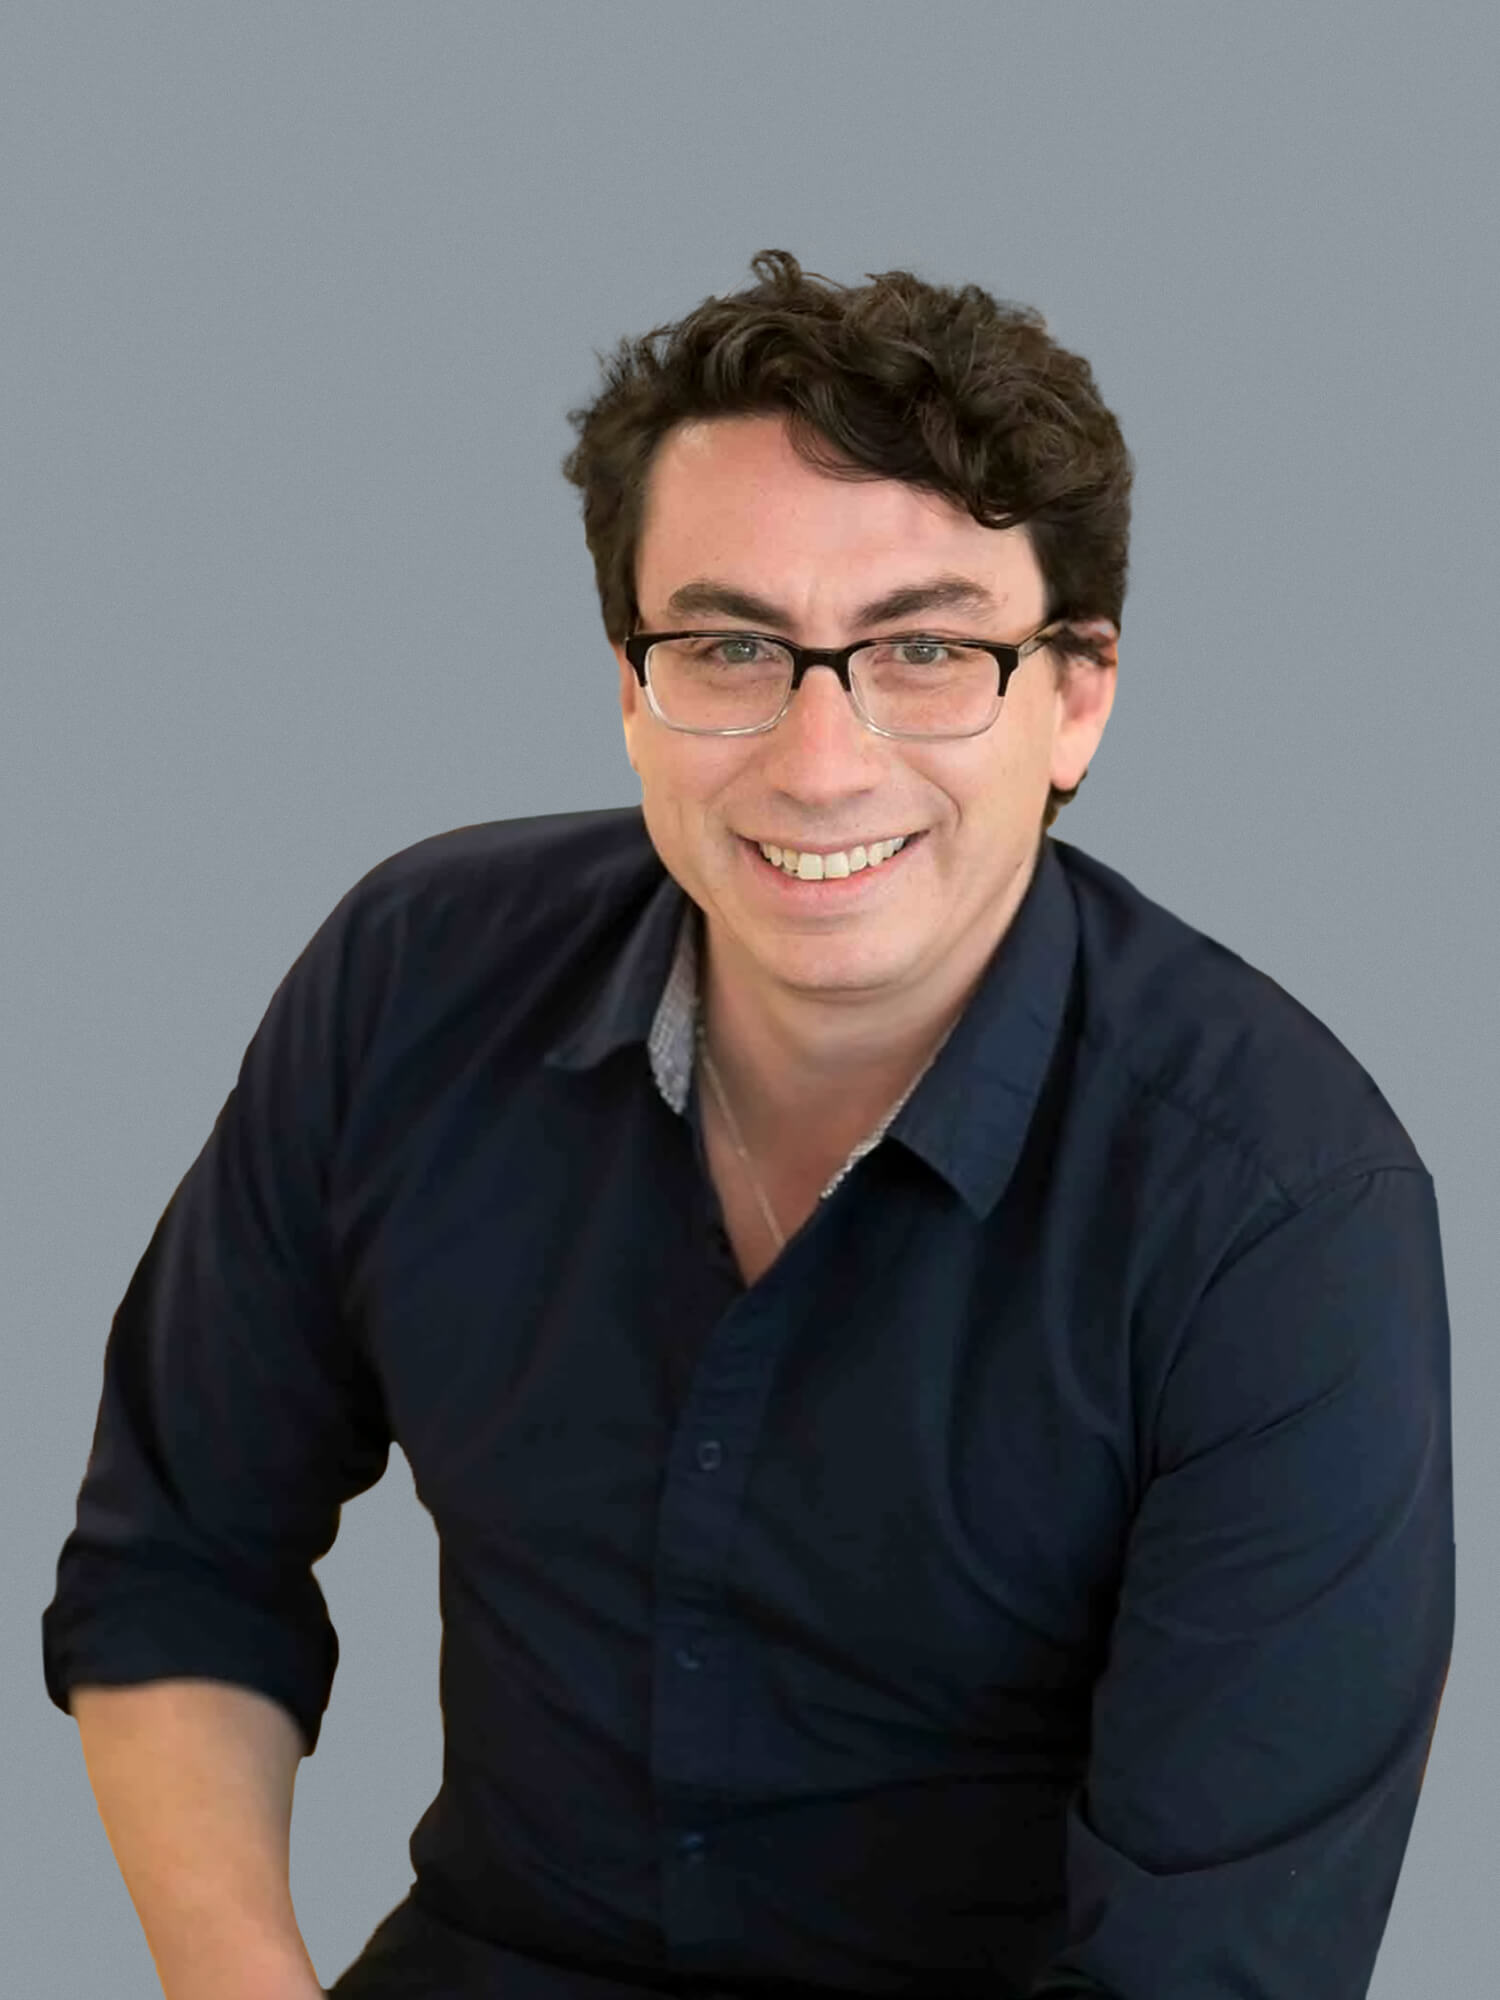 Glean Straub - VP, Business Development